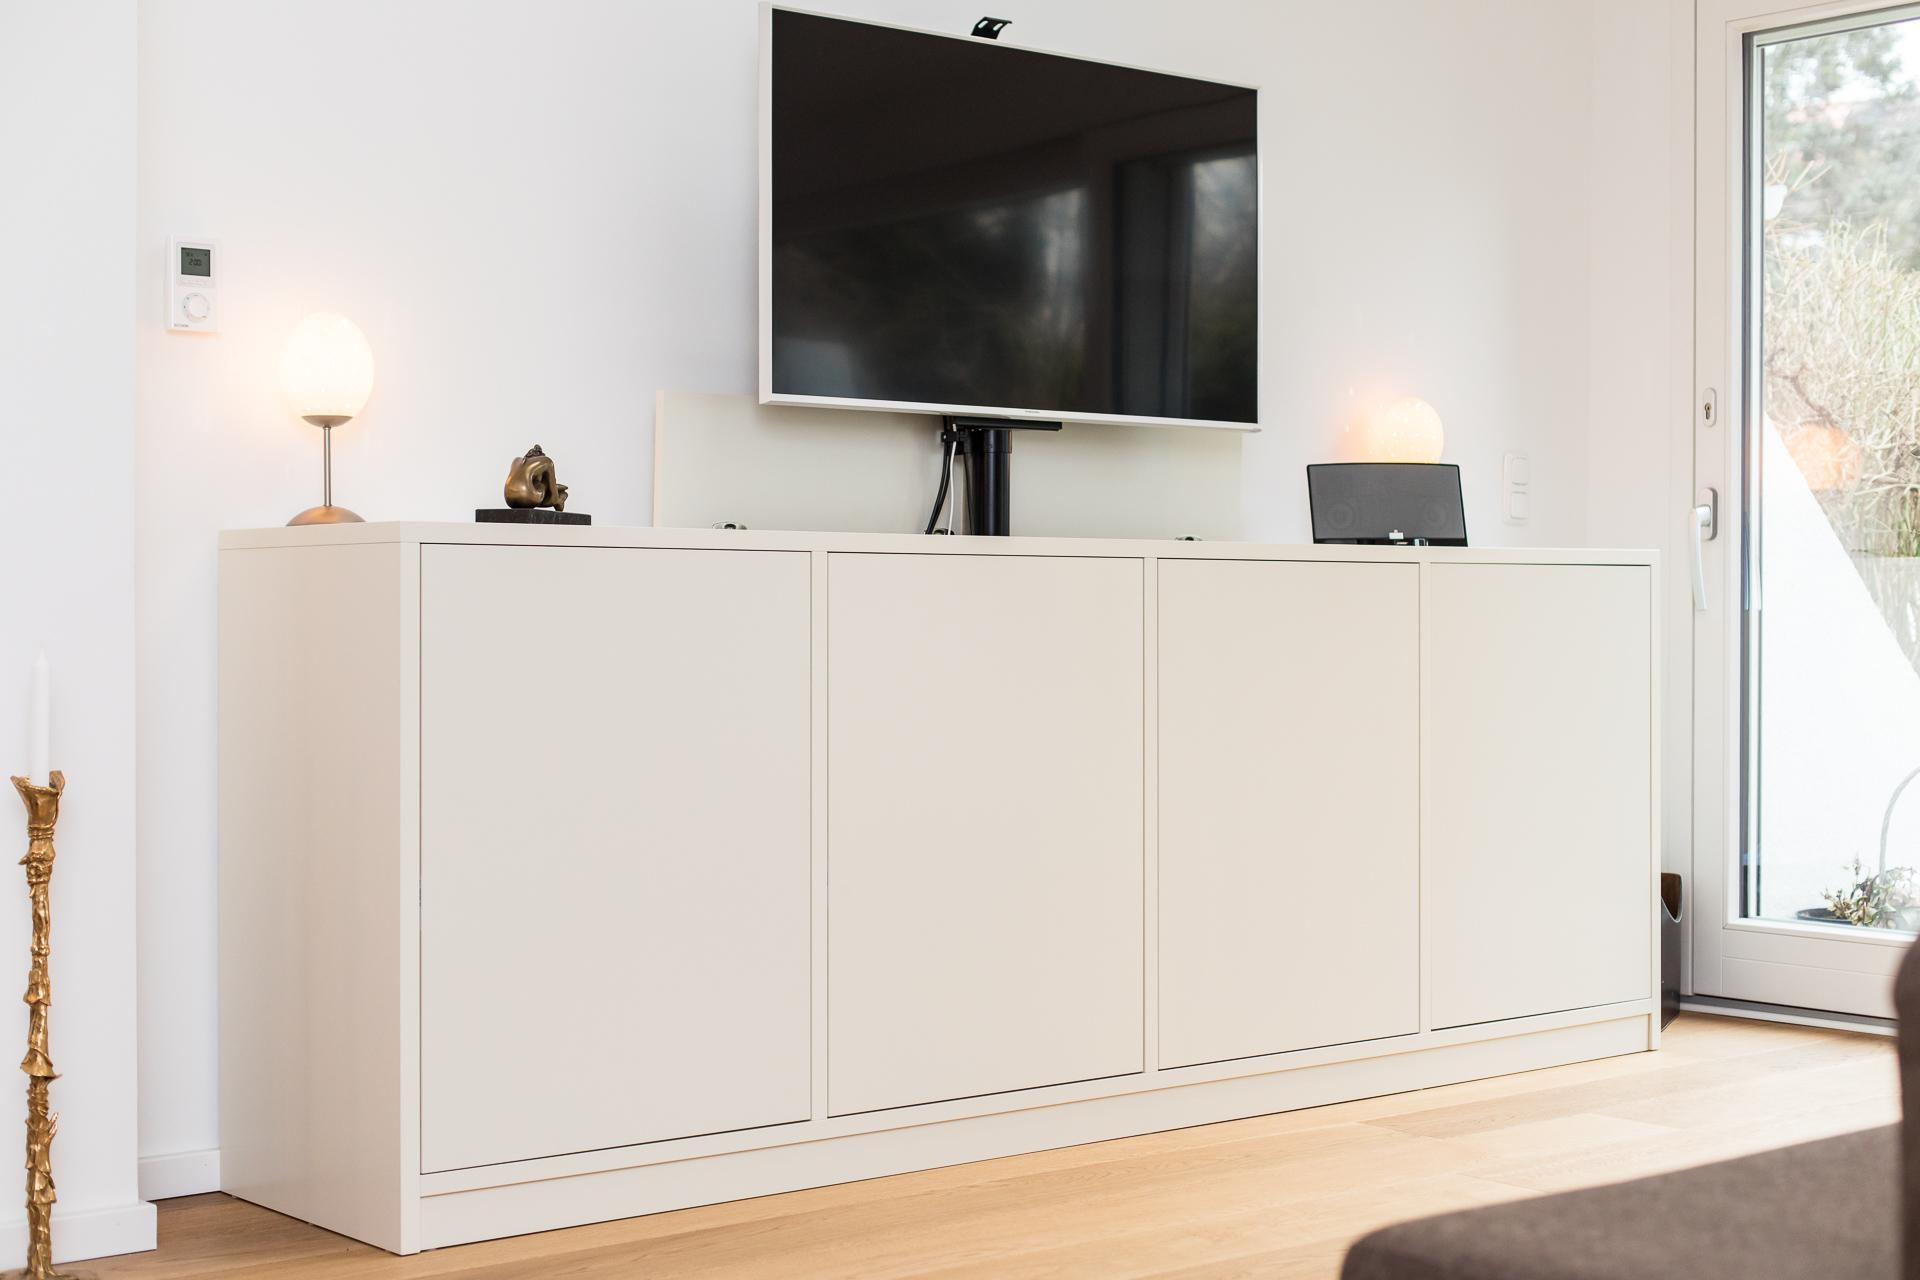 Sideboard Mit Tv Lift lackierte kommode mit integriertem tv-lift #kommode